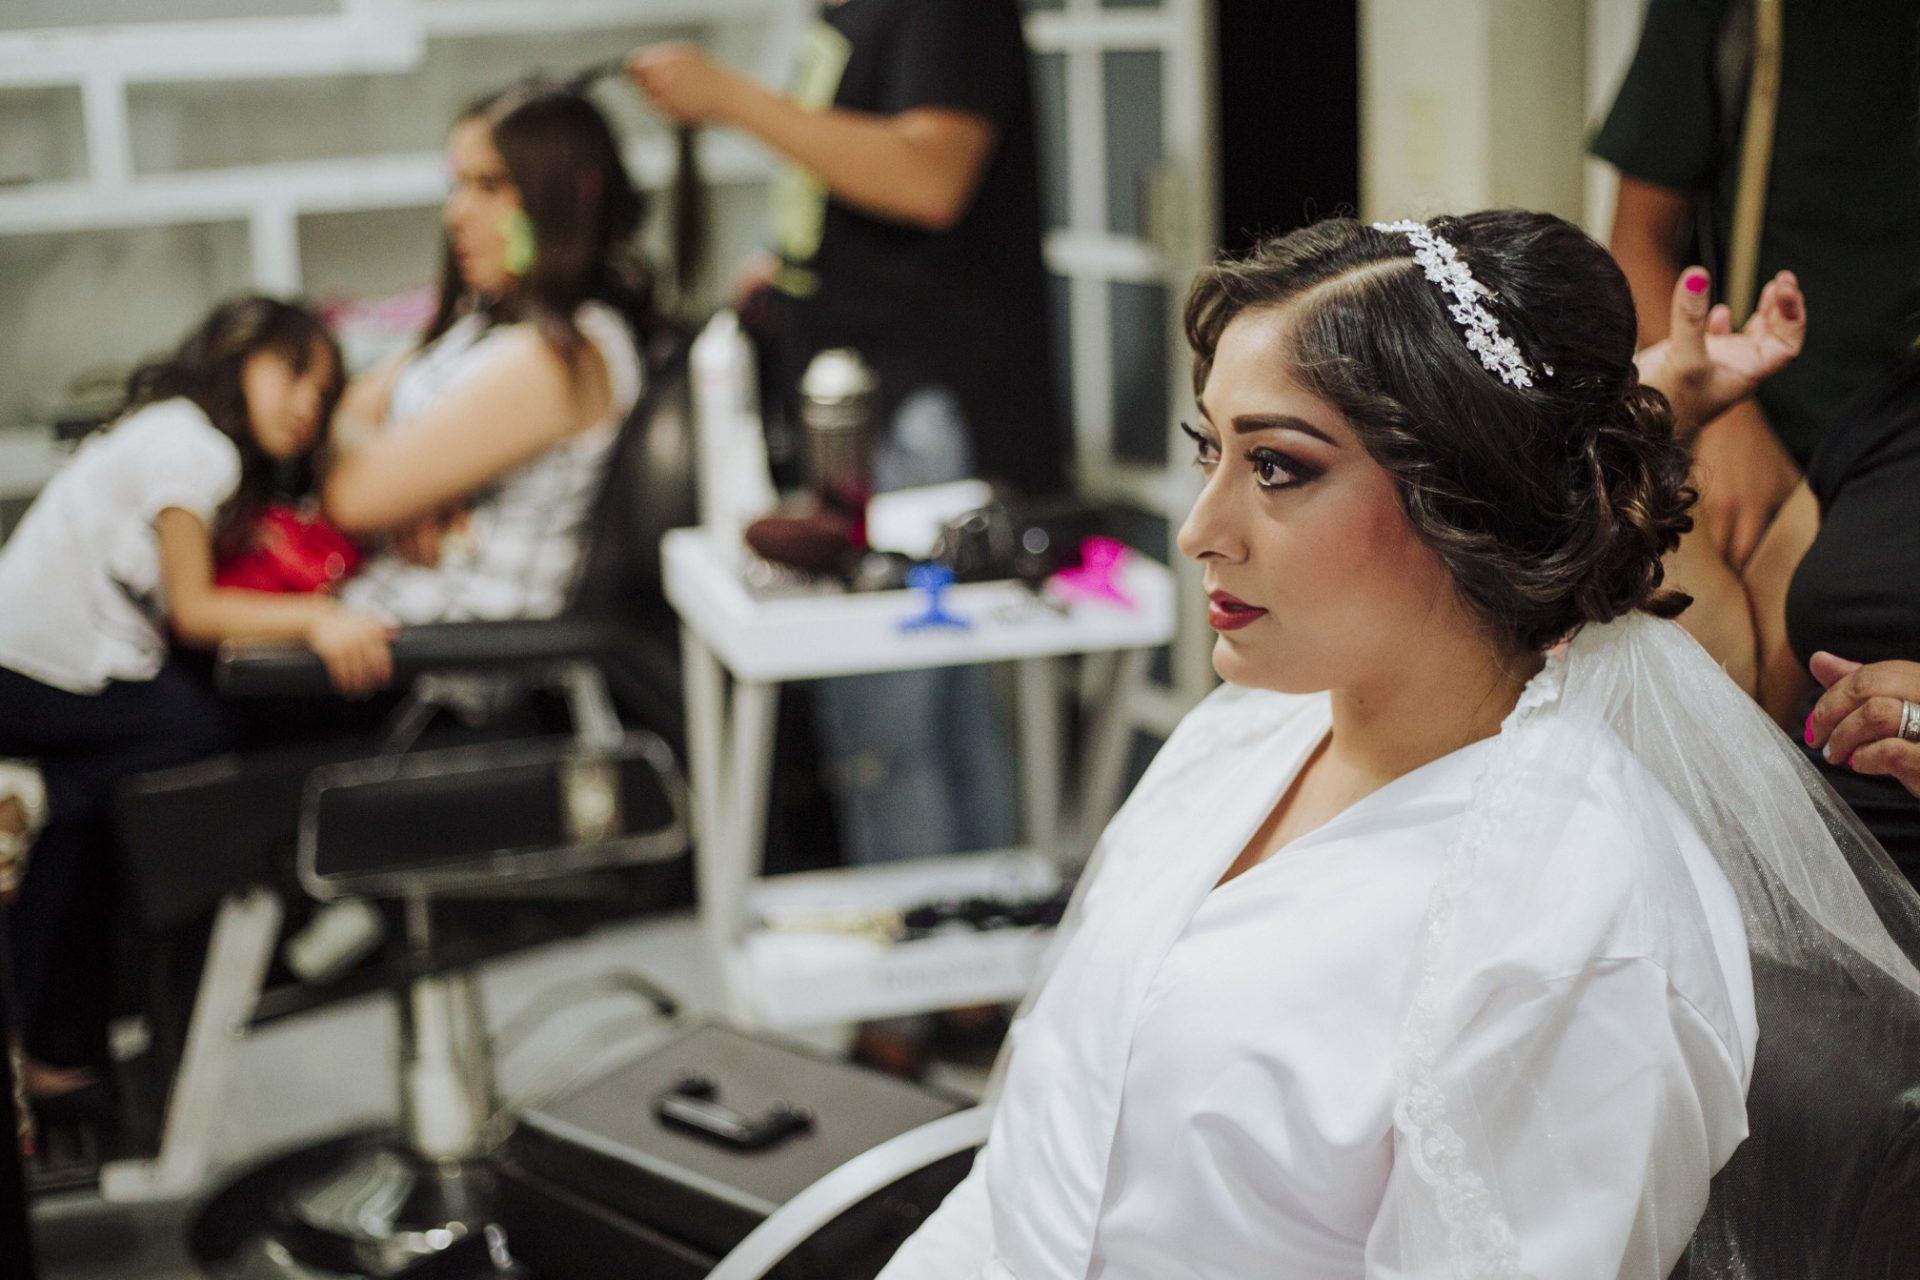 fotografo_profesional_zacatecas_chihuahua_bodas_xv_mexico-15